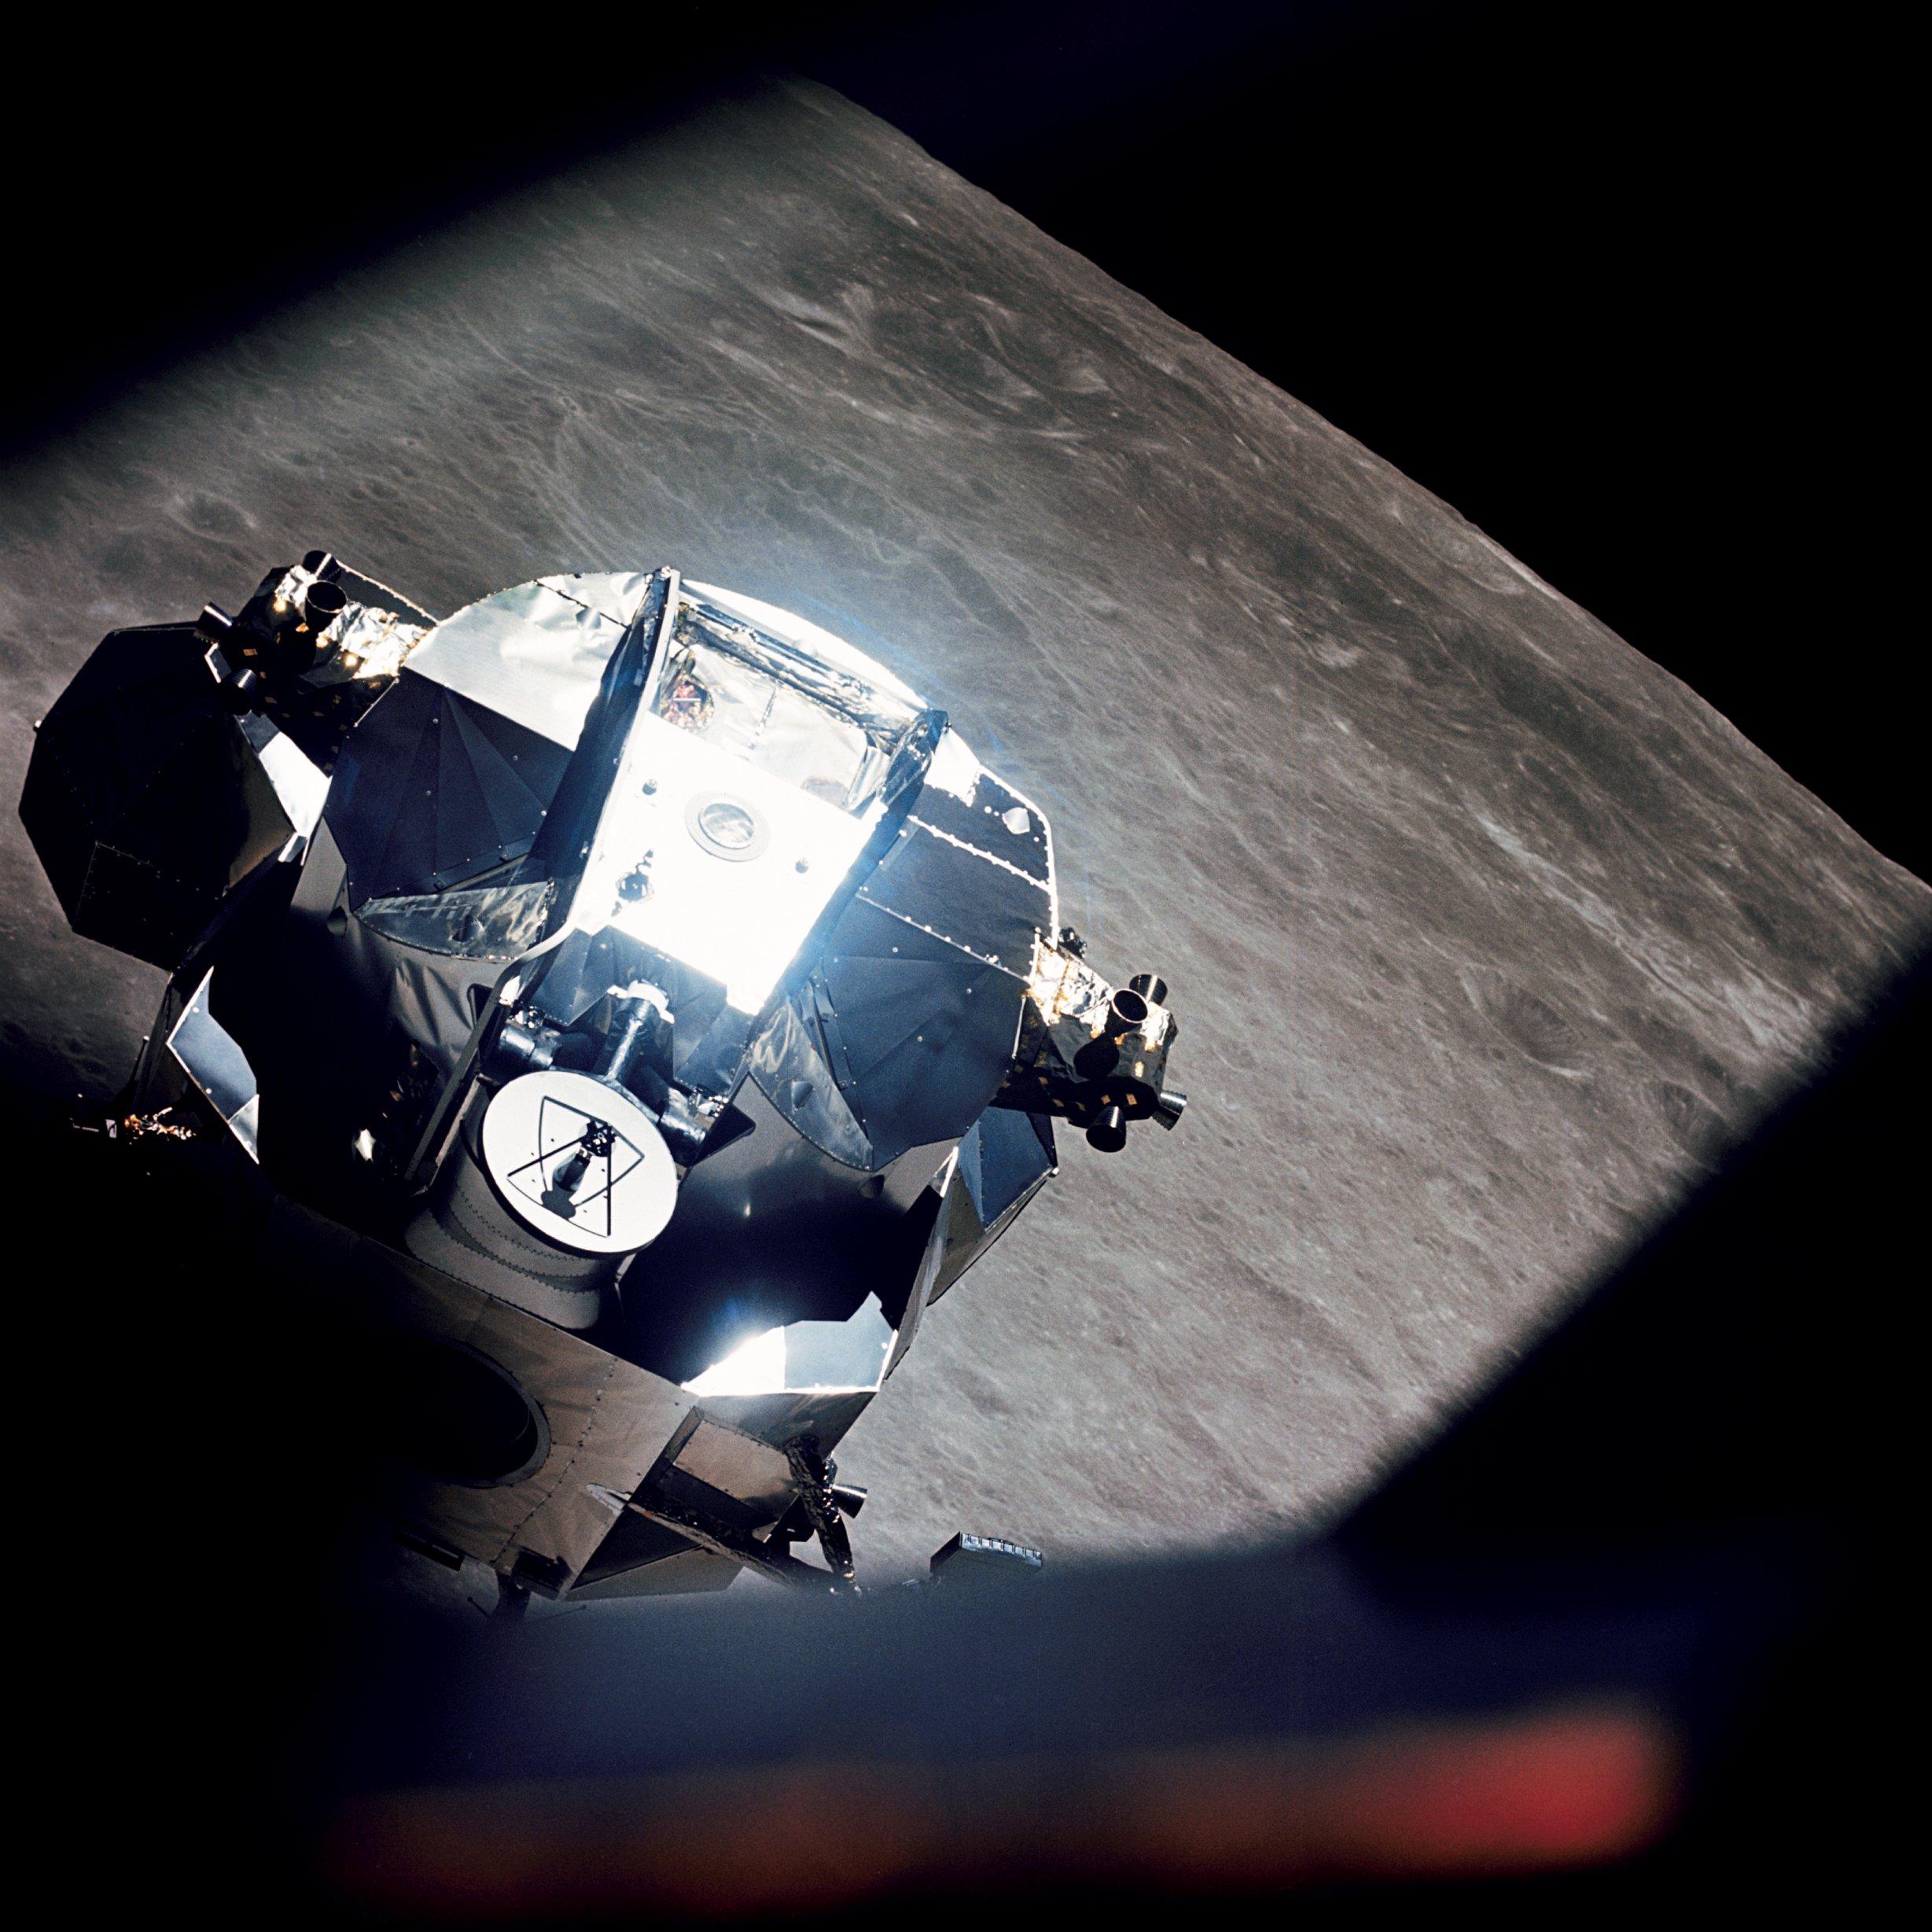 Apollo_10_Lunar_Module_Rendezvous